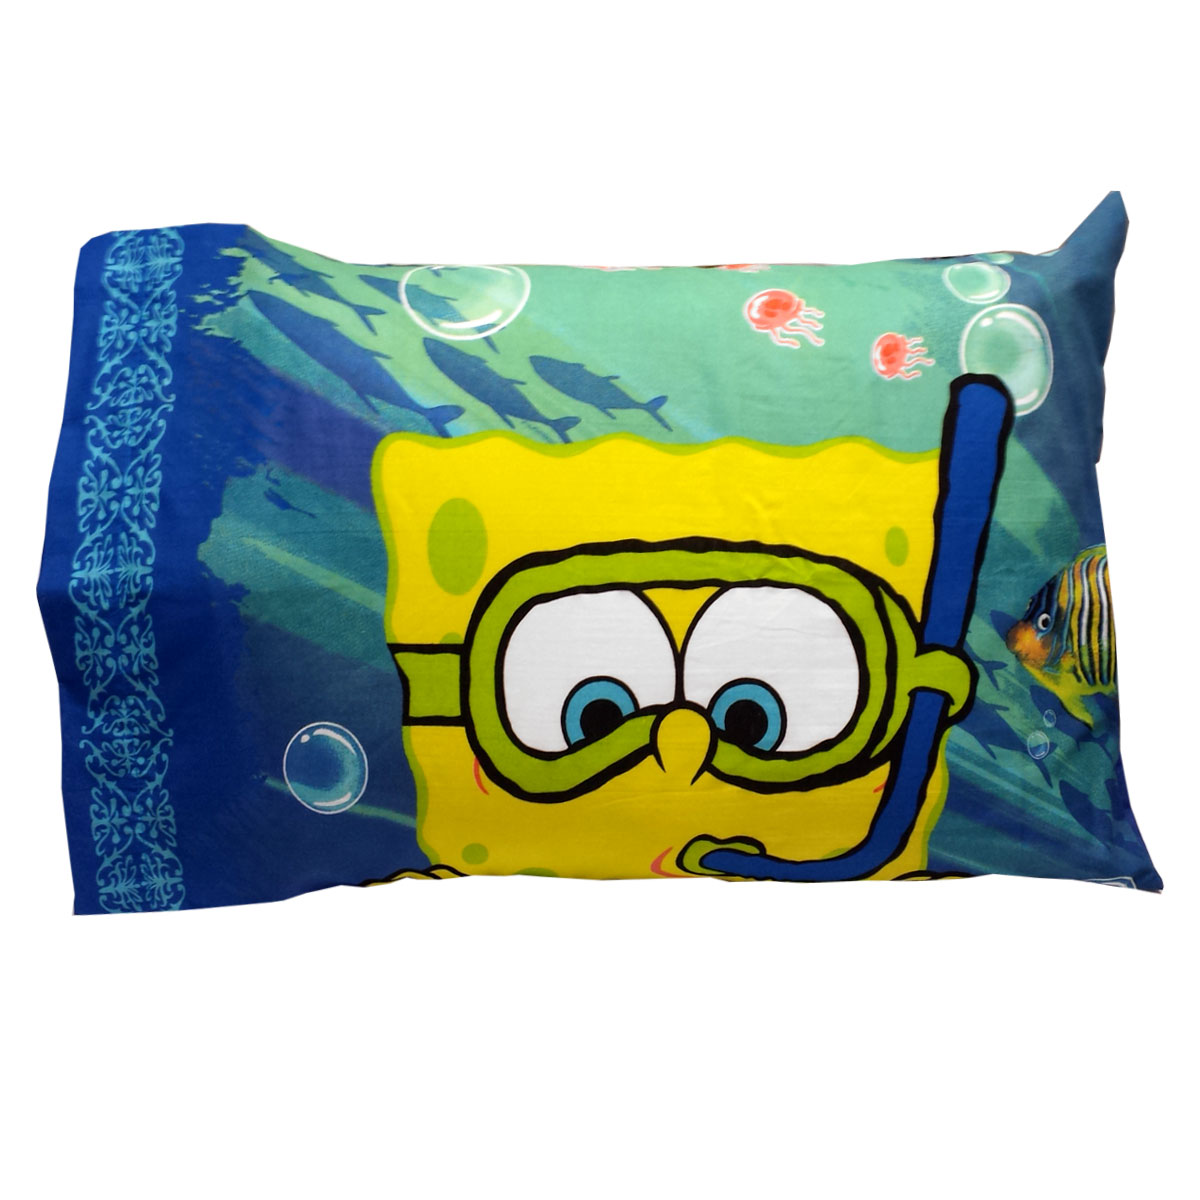 spongebob squarepants pillowcase sea adventure pillow cover walmart com